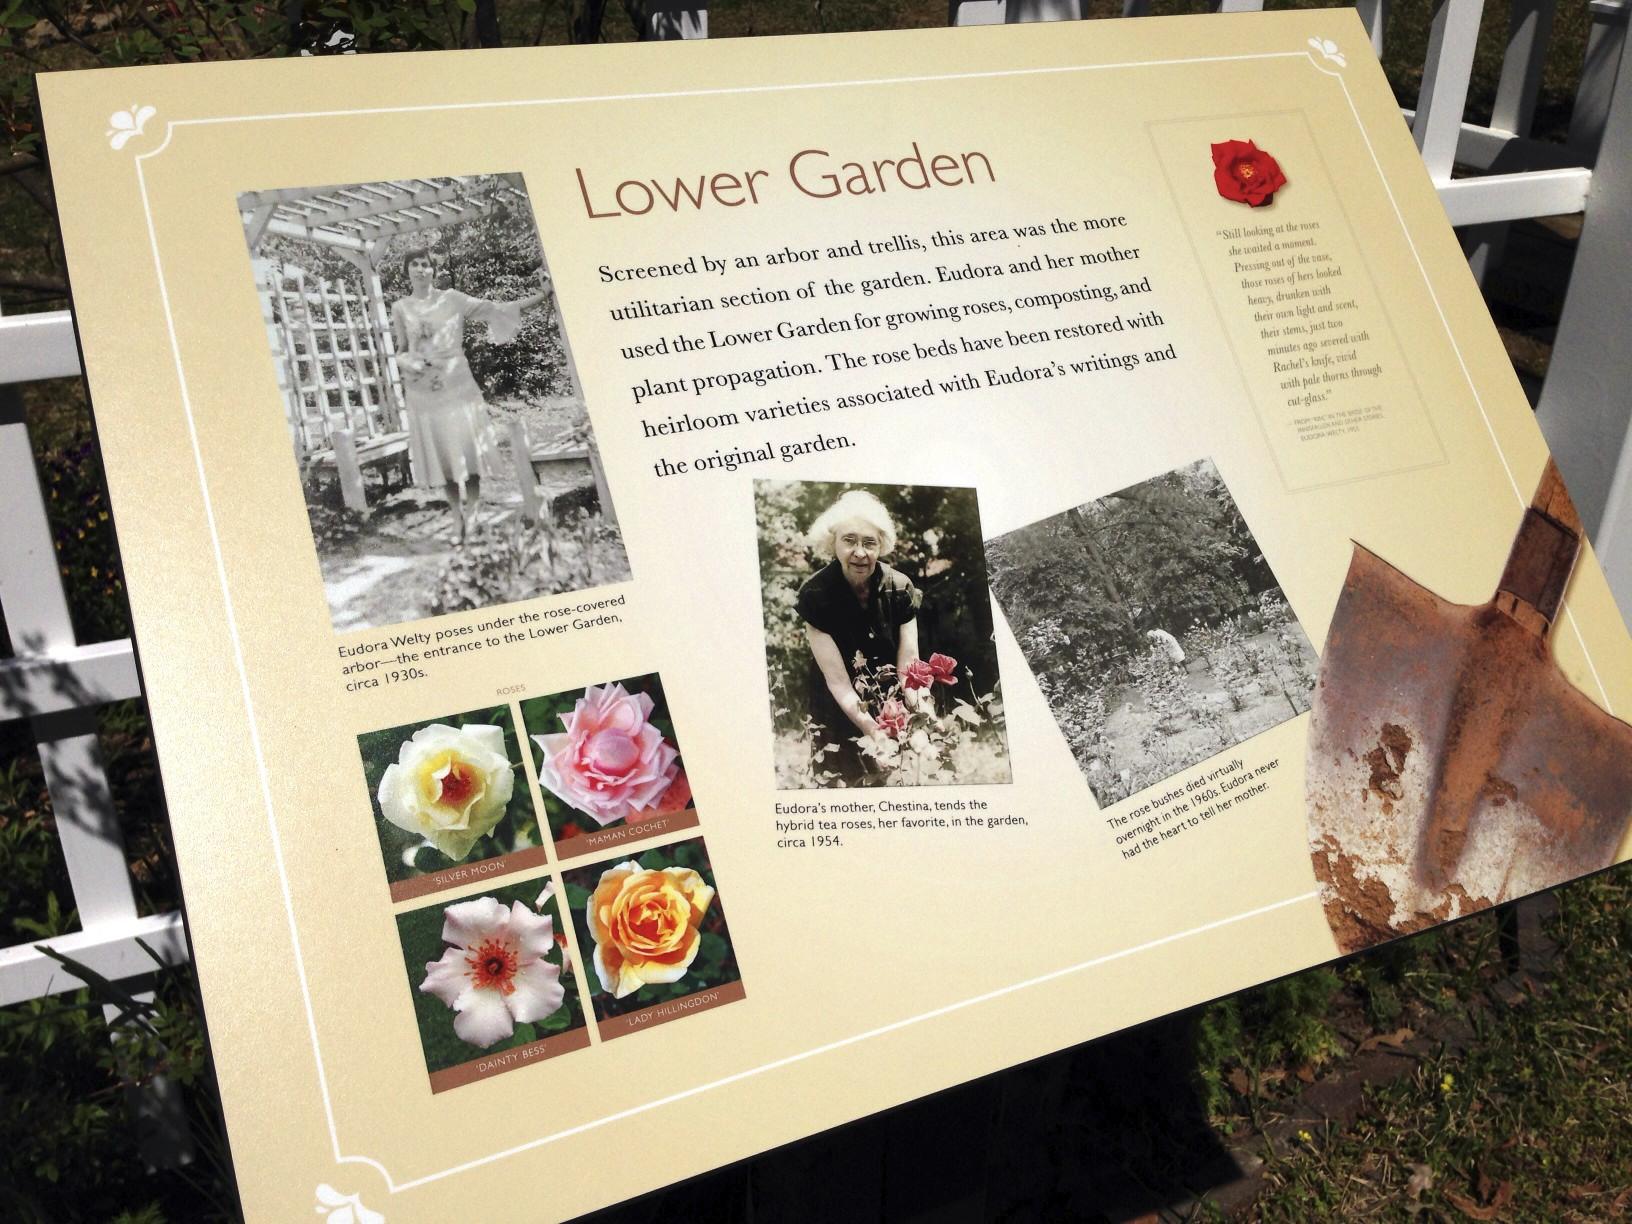 Signage in the Eudora Welty Garden